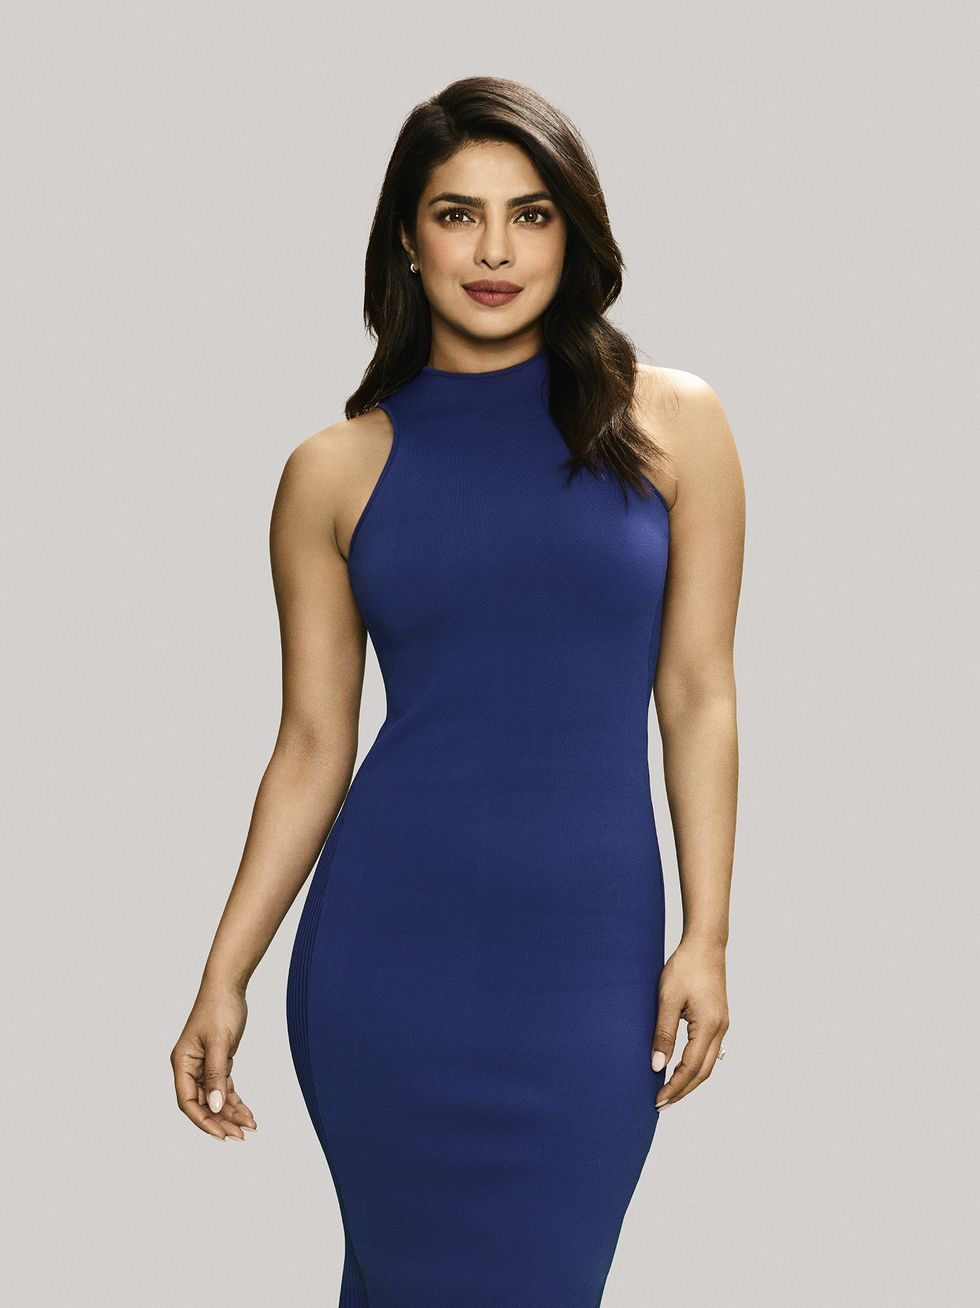 Exclusive: Priyanka Chopra Jonas Is the New Face Obagi Skincare